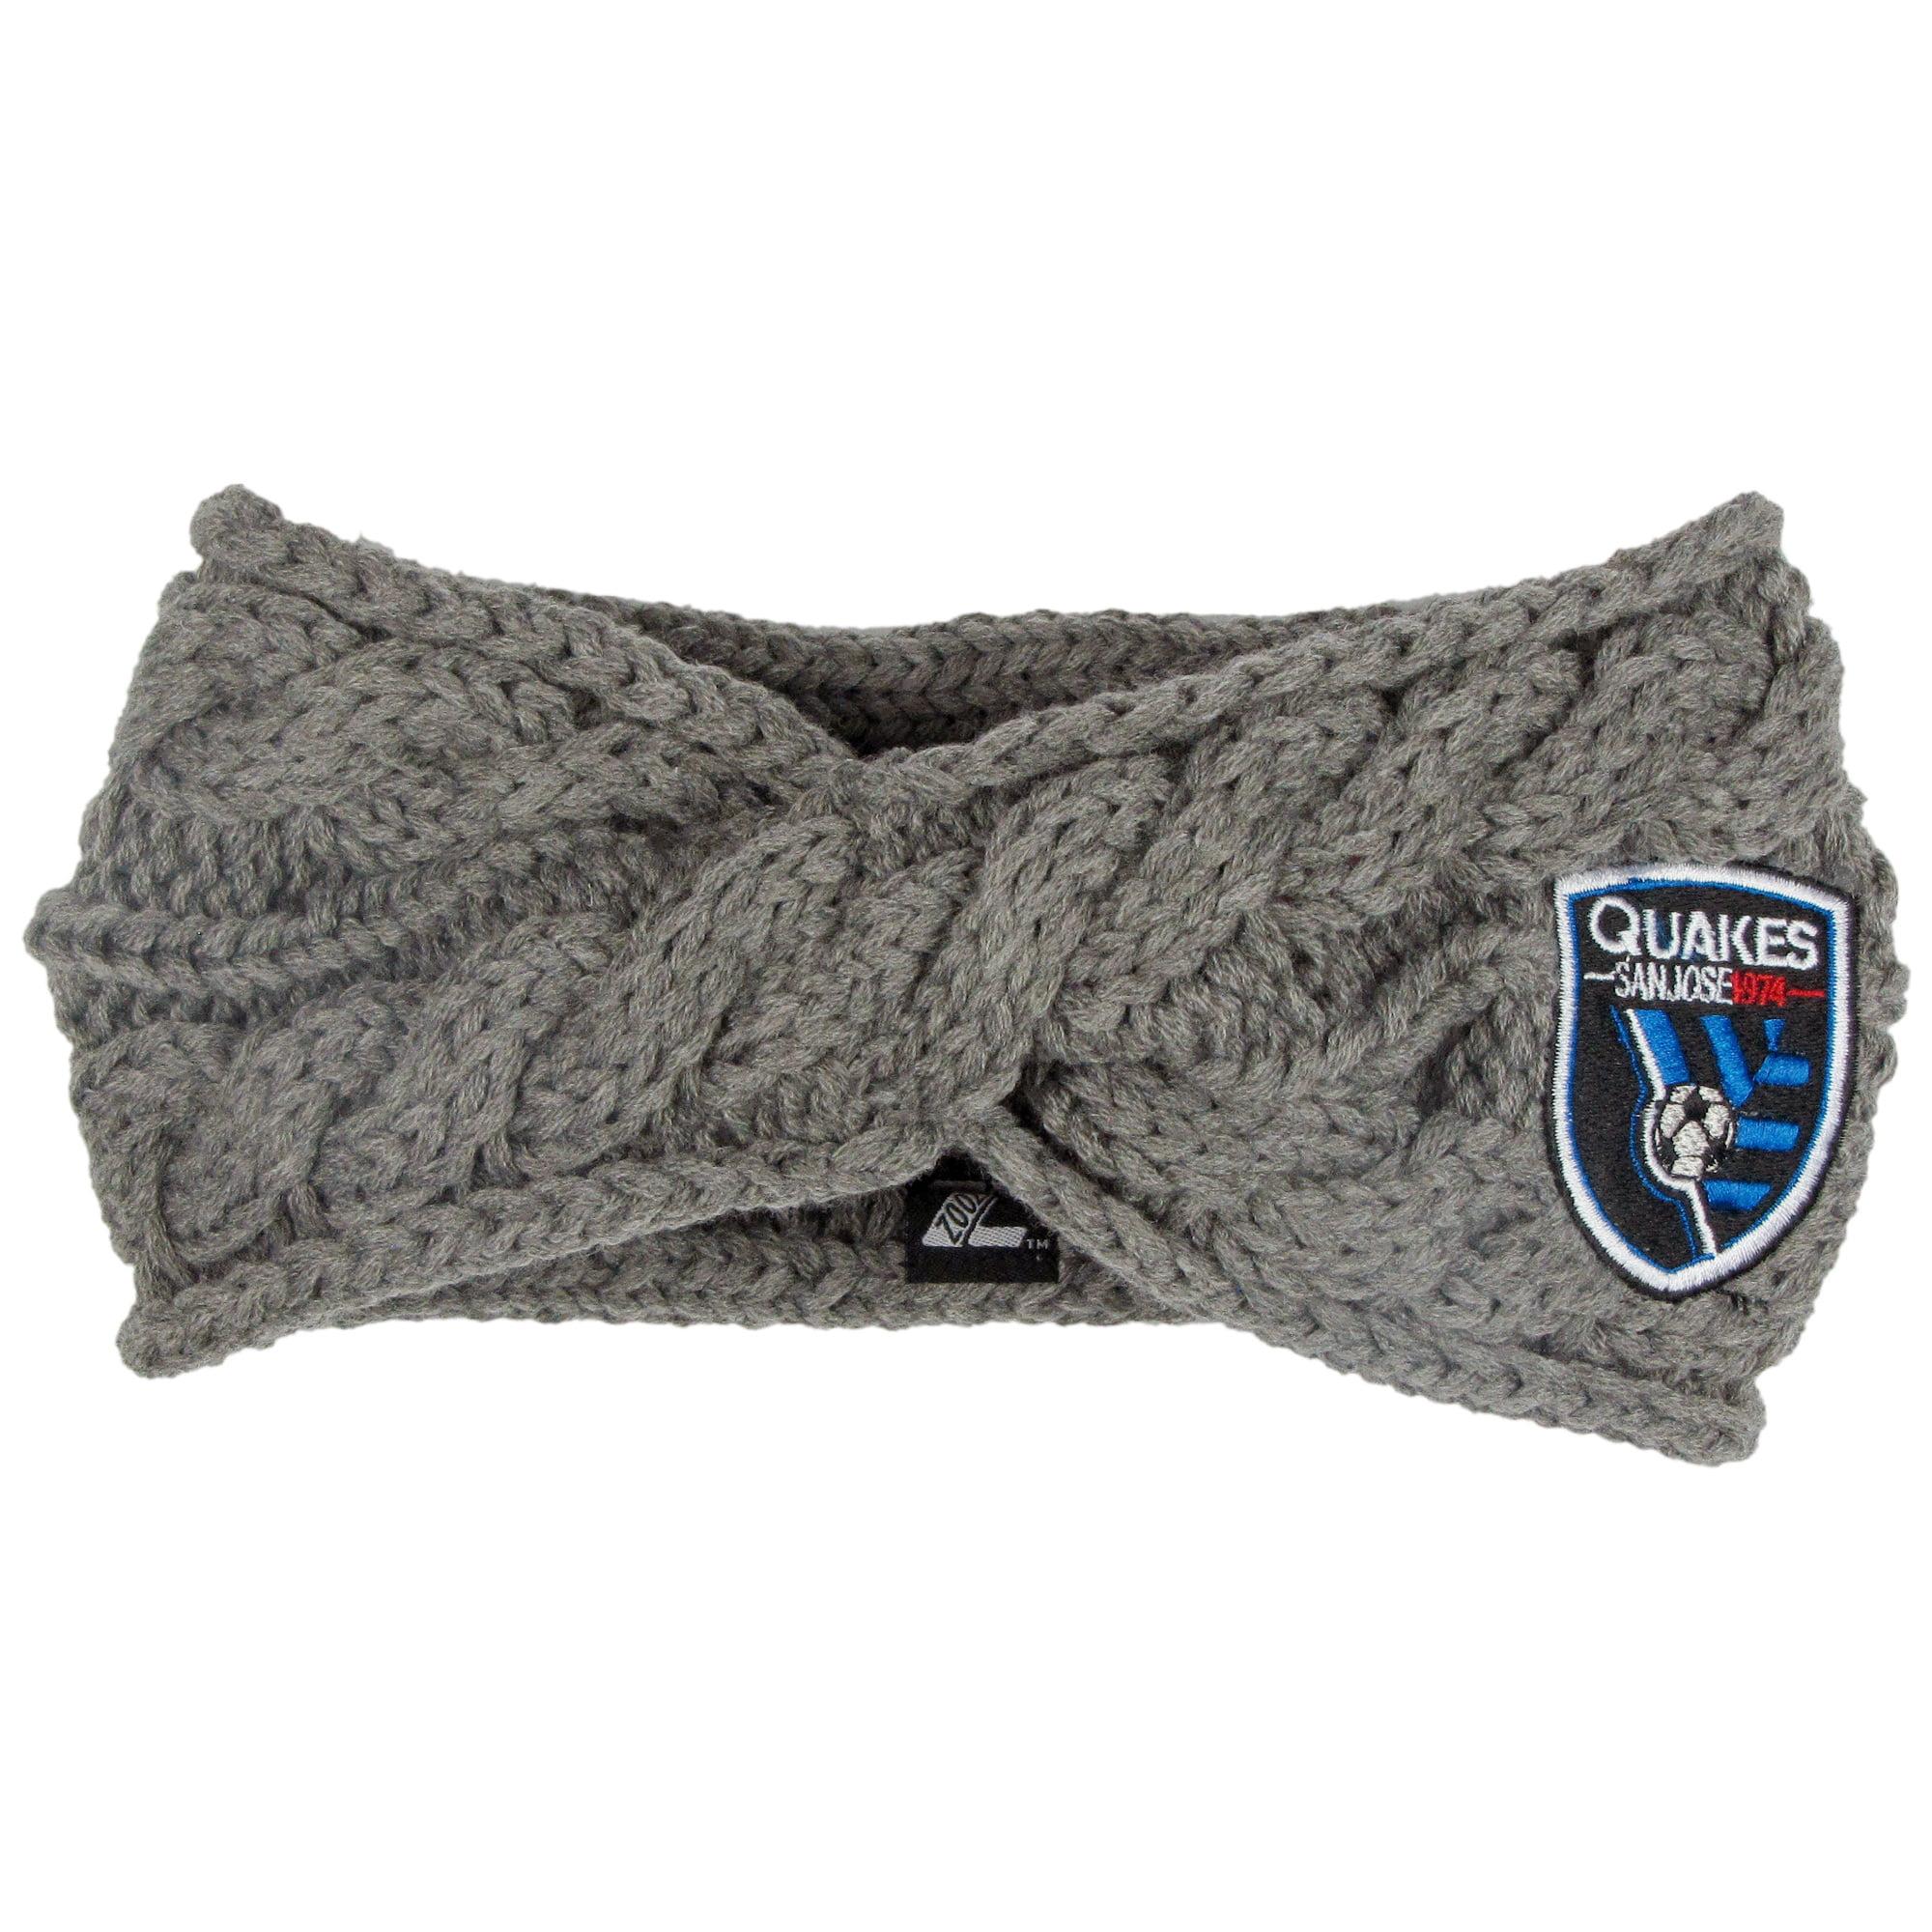 San Jose Earthquakes ZooZatz Women's Cable Headband - Charcoal - No Size